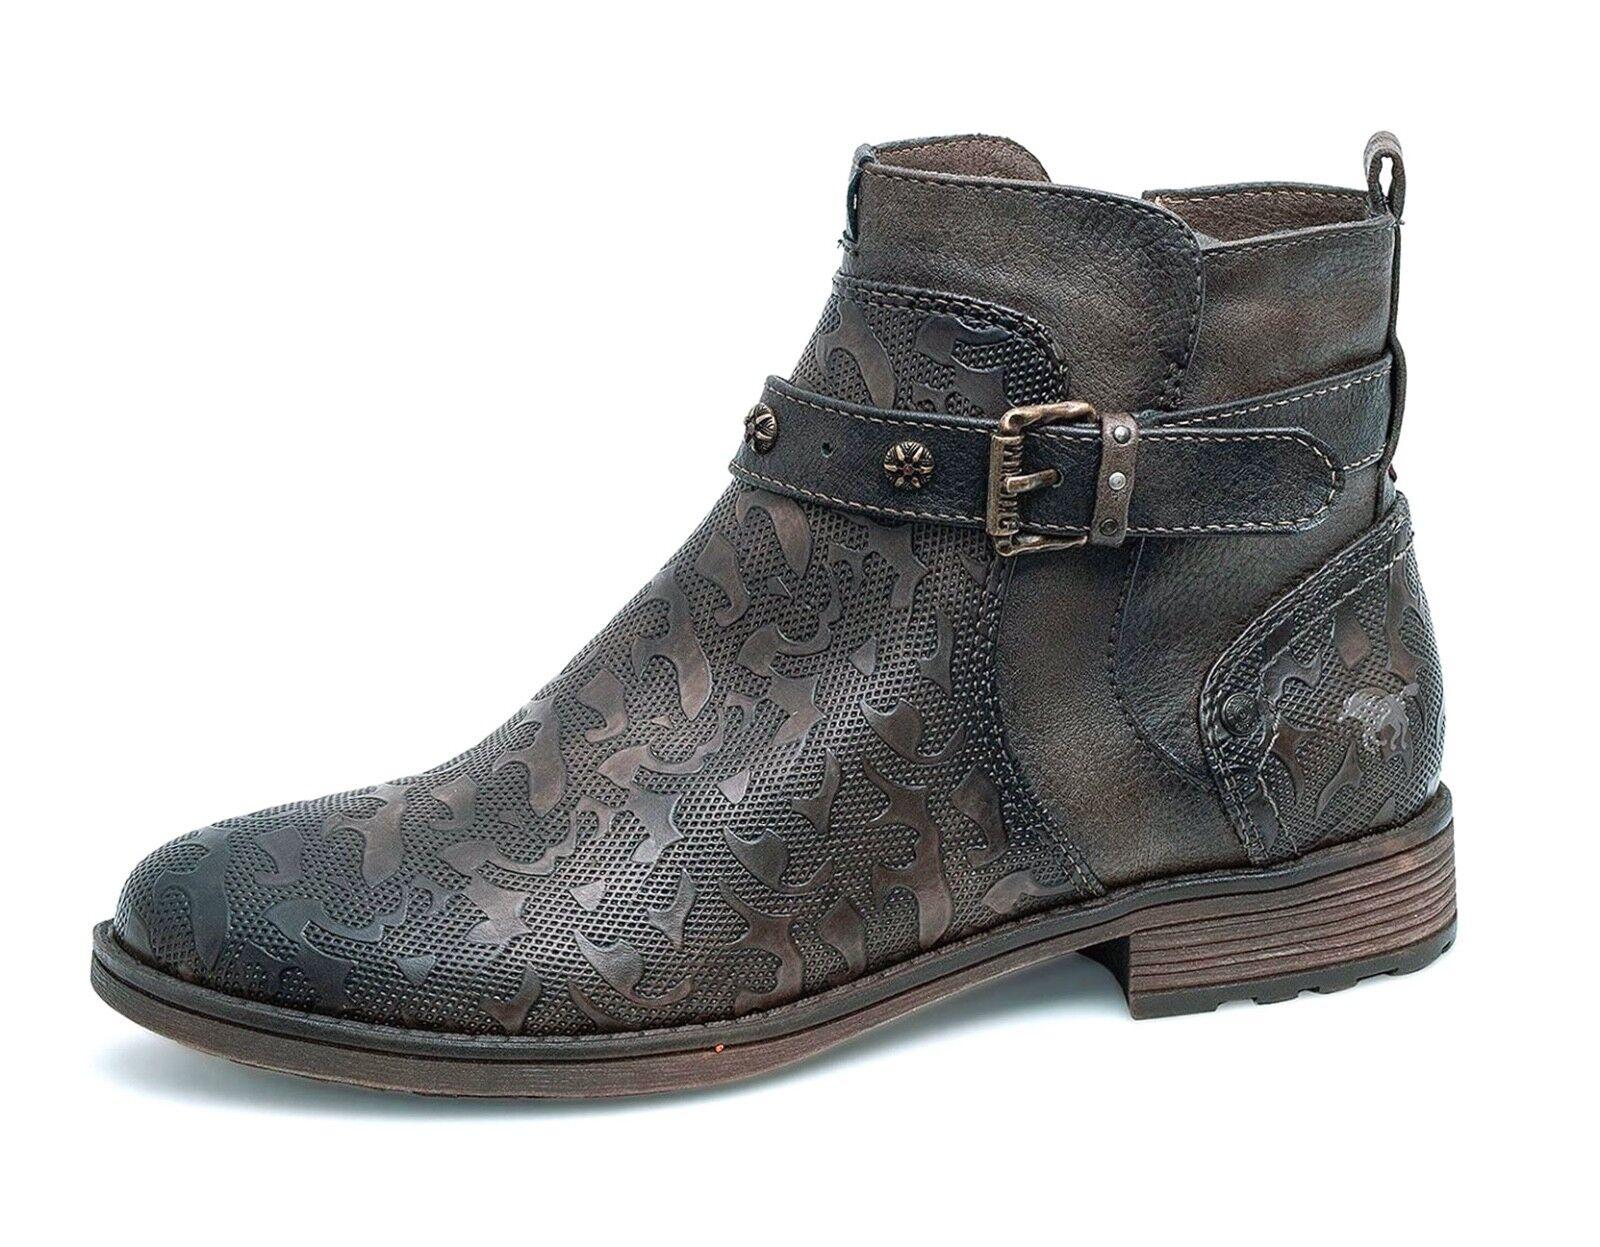 Mustang NEW 1265-515 braun texturot western style low heel ankle Stiefel Größe 4-8